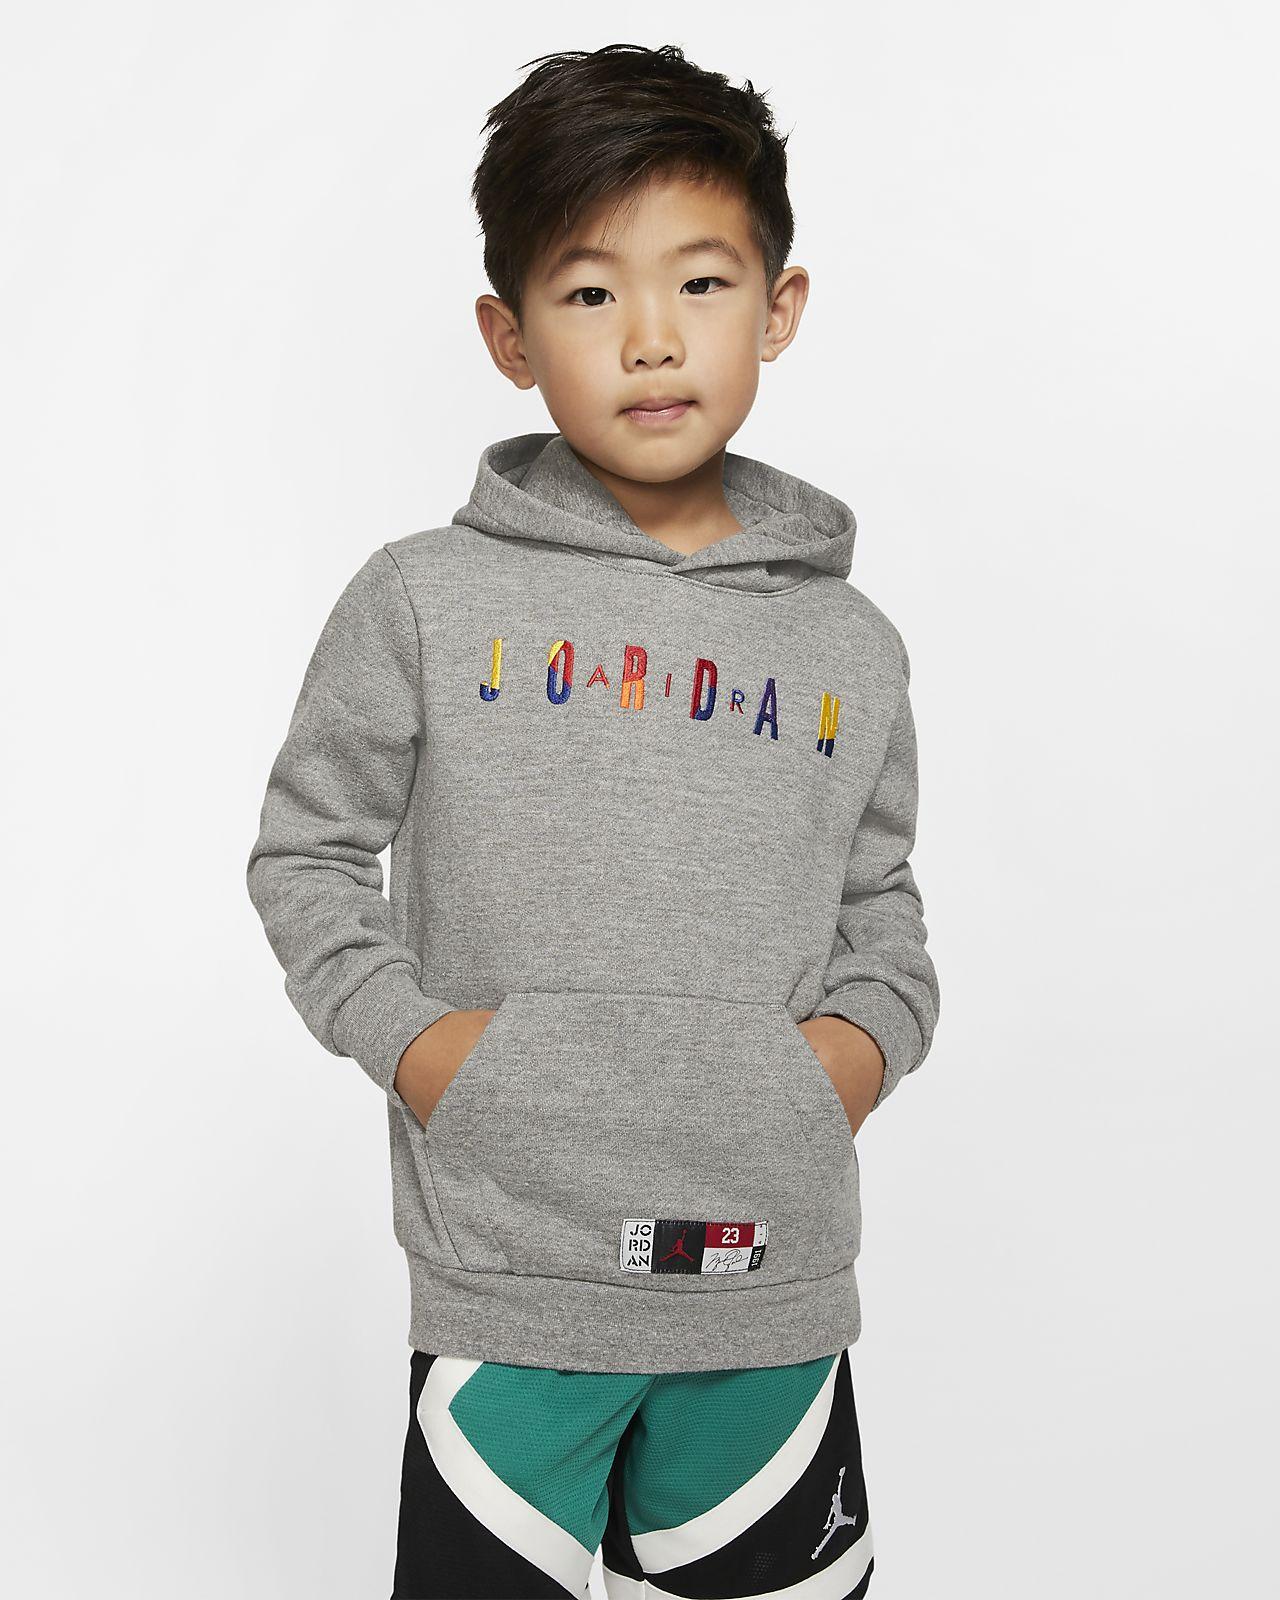 Air Jordan Sudadera con capucha de tejido Fleece - Niño/a pequeño/a